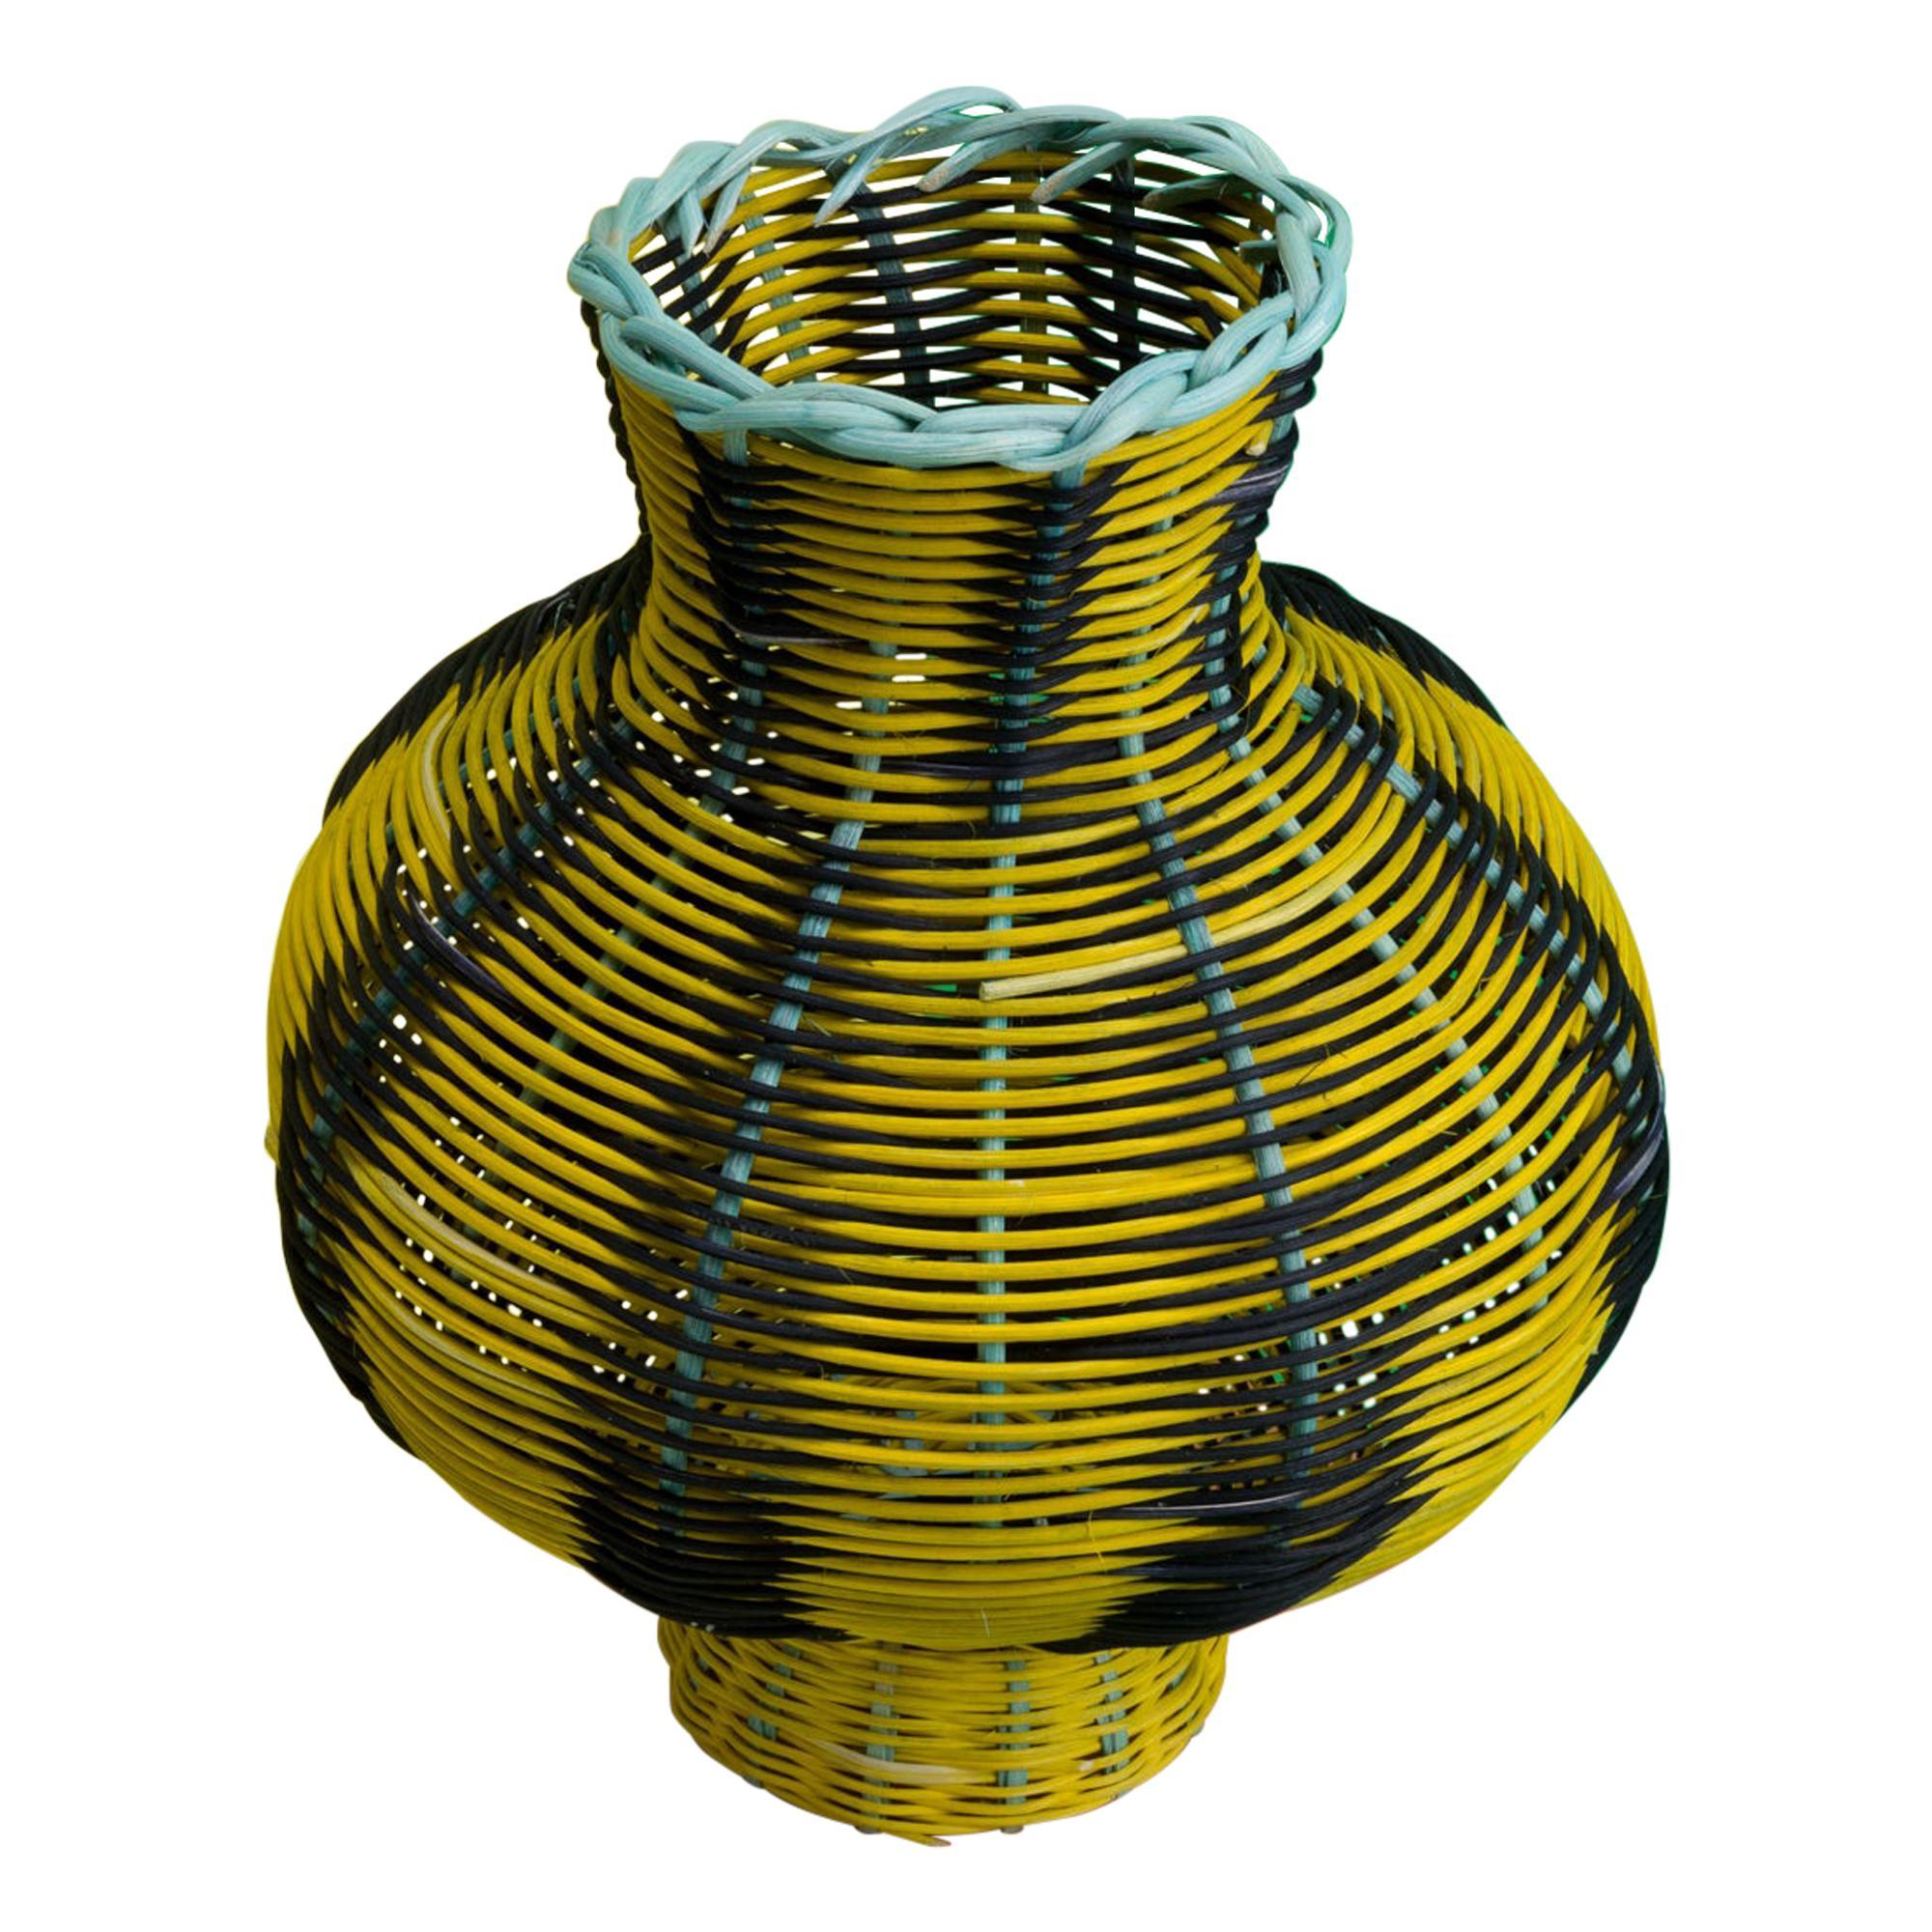 Amphora Vase Woven in Lemon, Black, Green by Studio Herron